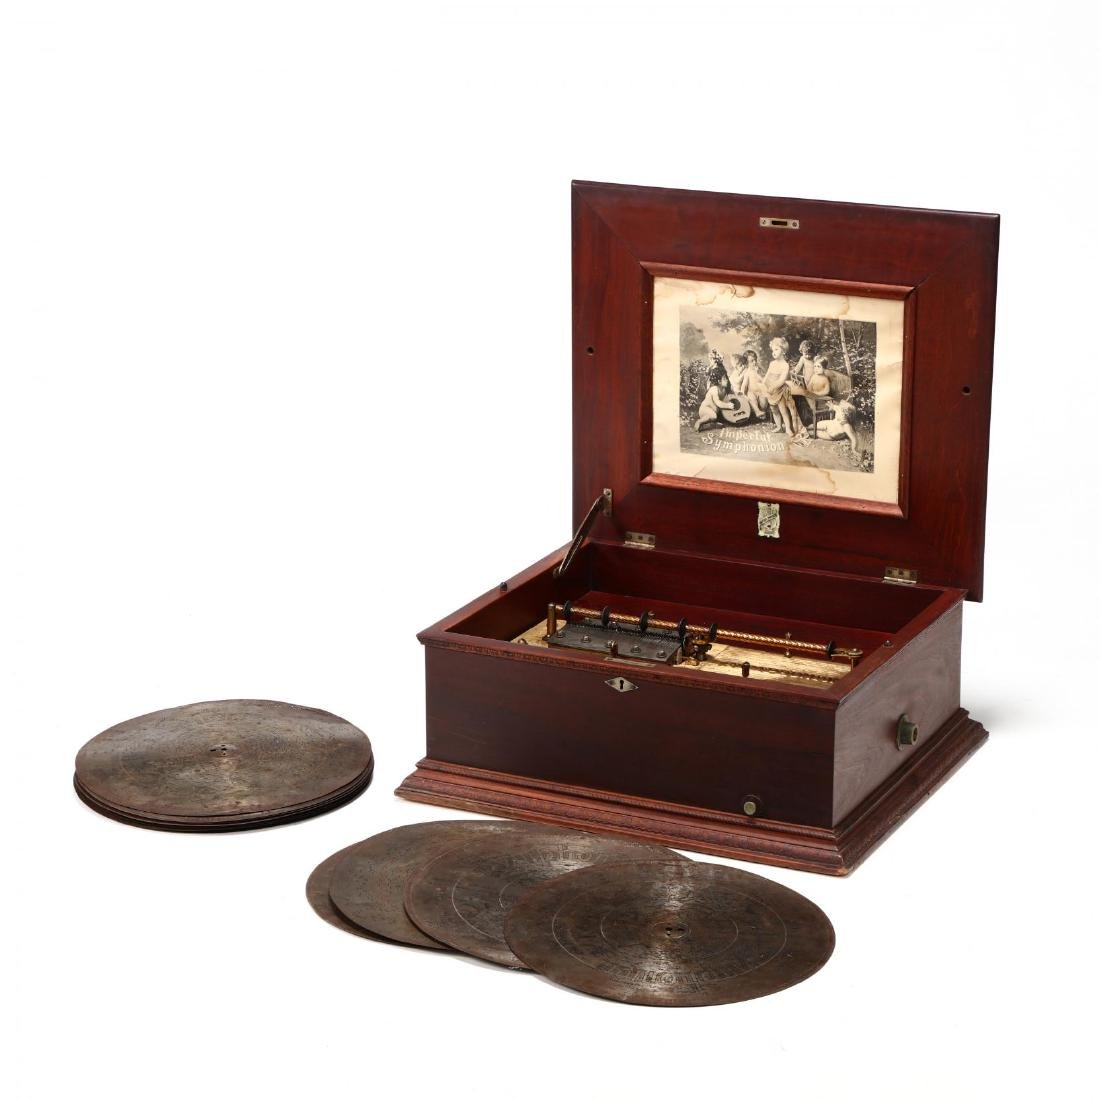 Imperial Symphonion Double Comb Disc Music Box